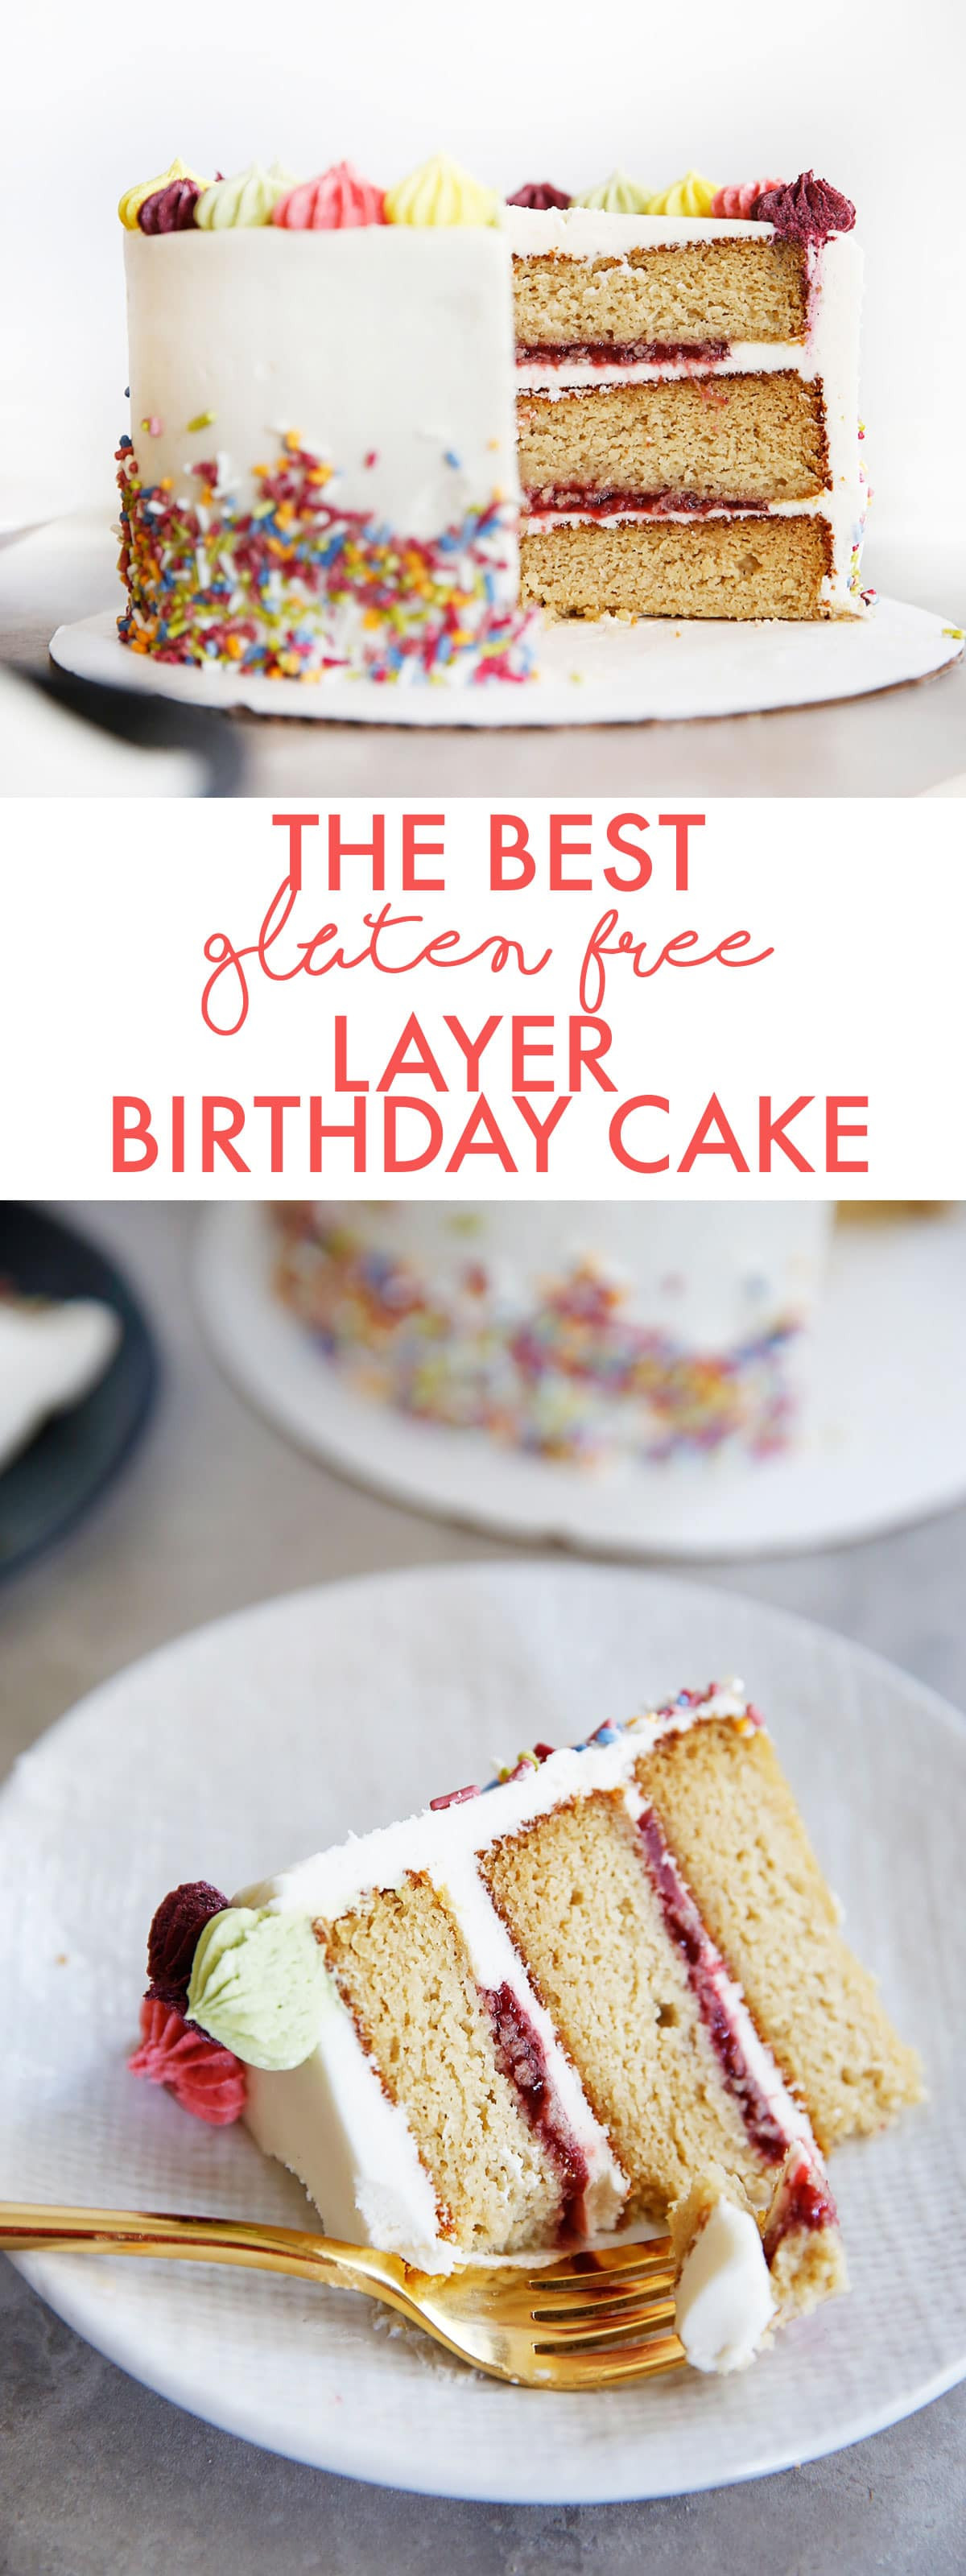 Best ideas about Gluten Free Birthday Cake . Save or Pin The BEST Gluten Free Layer Birthday Cake Lexi s Clean Now.